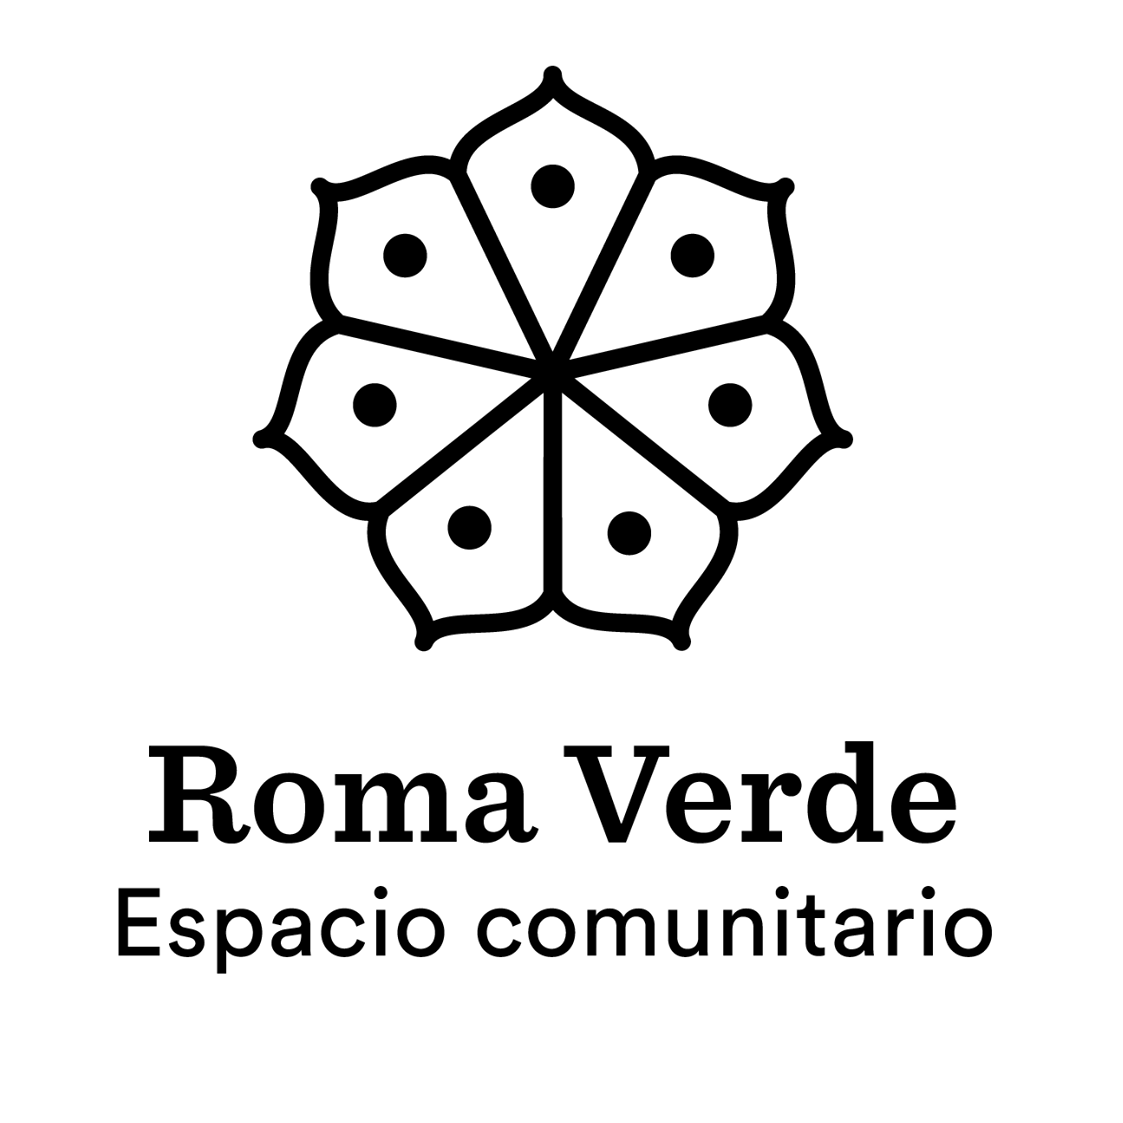 Roma Verde Espacio Comunitario